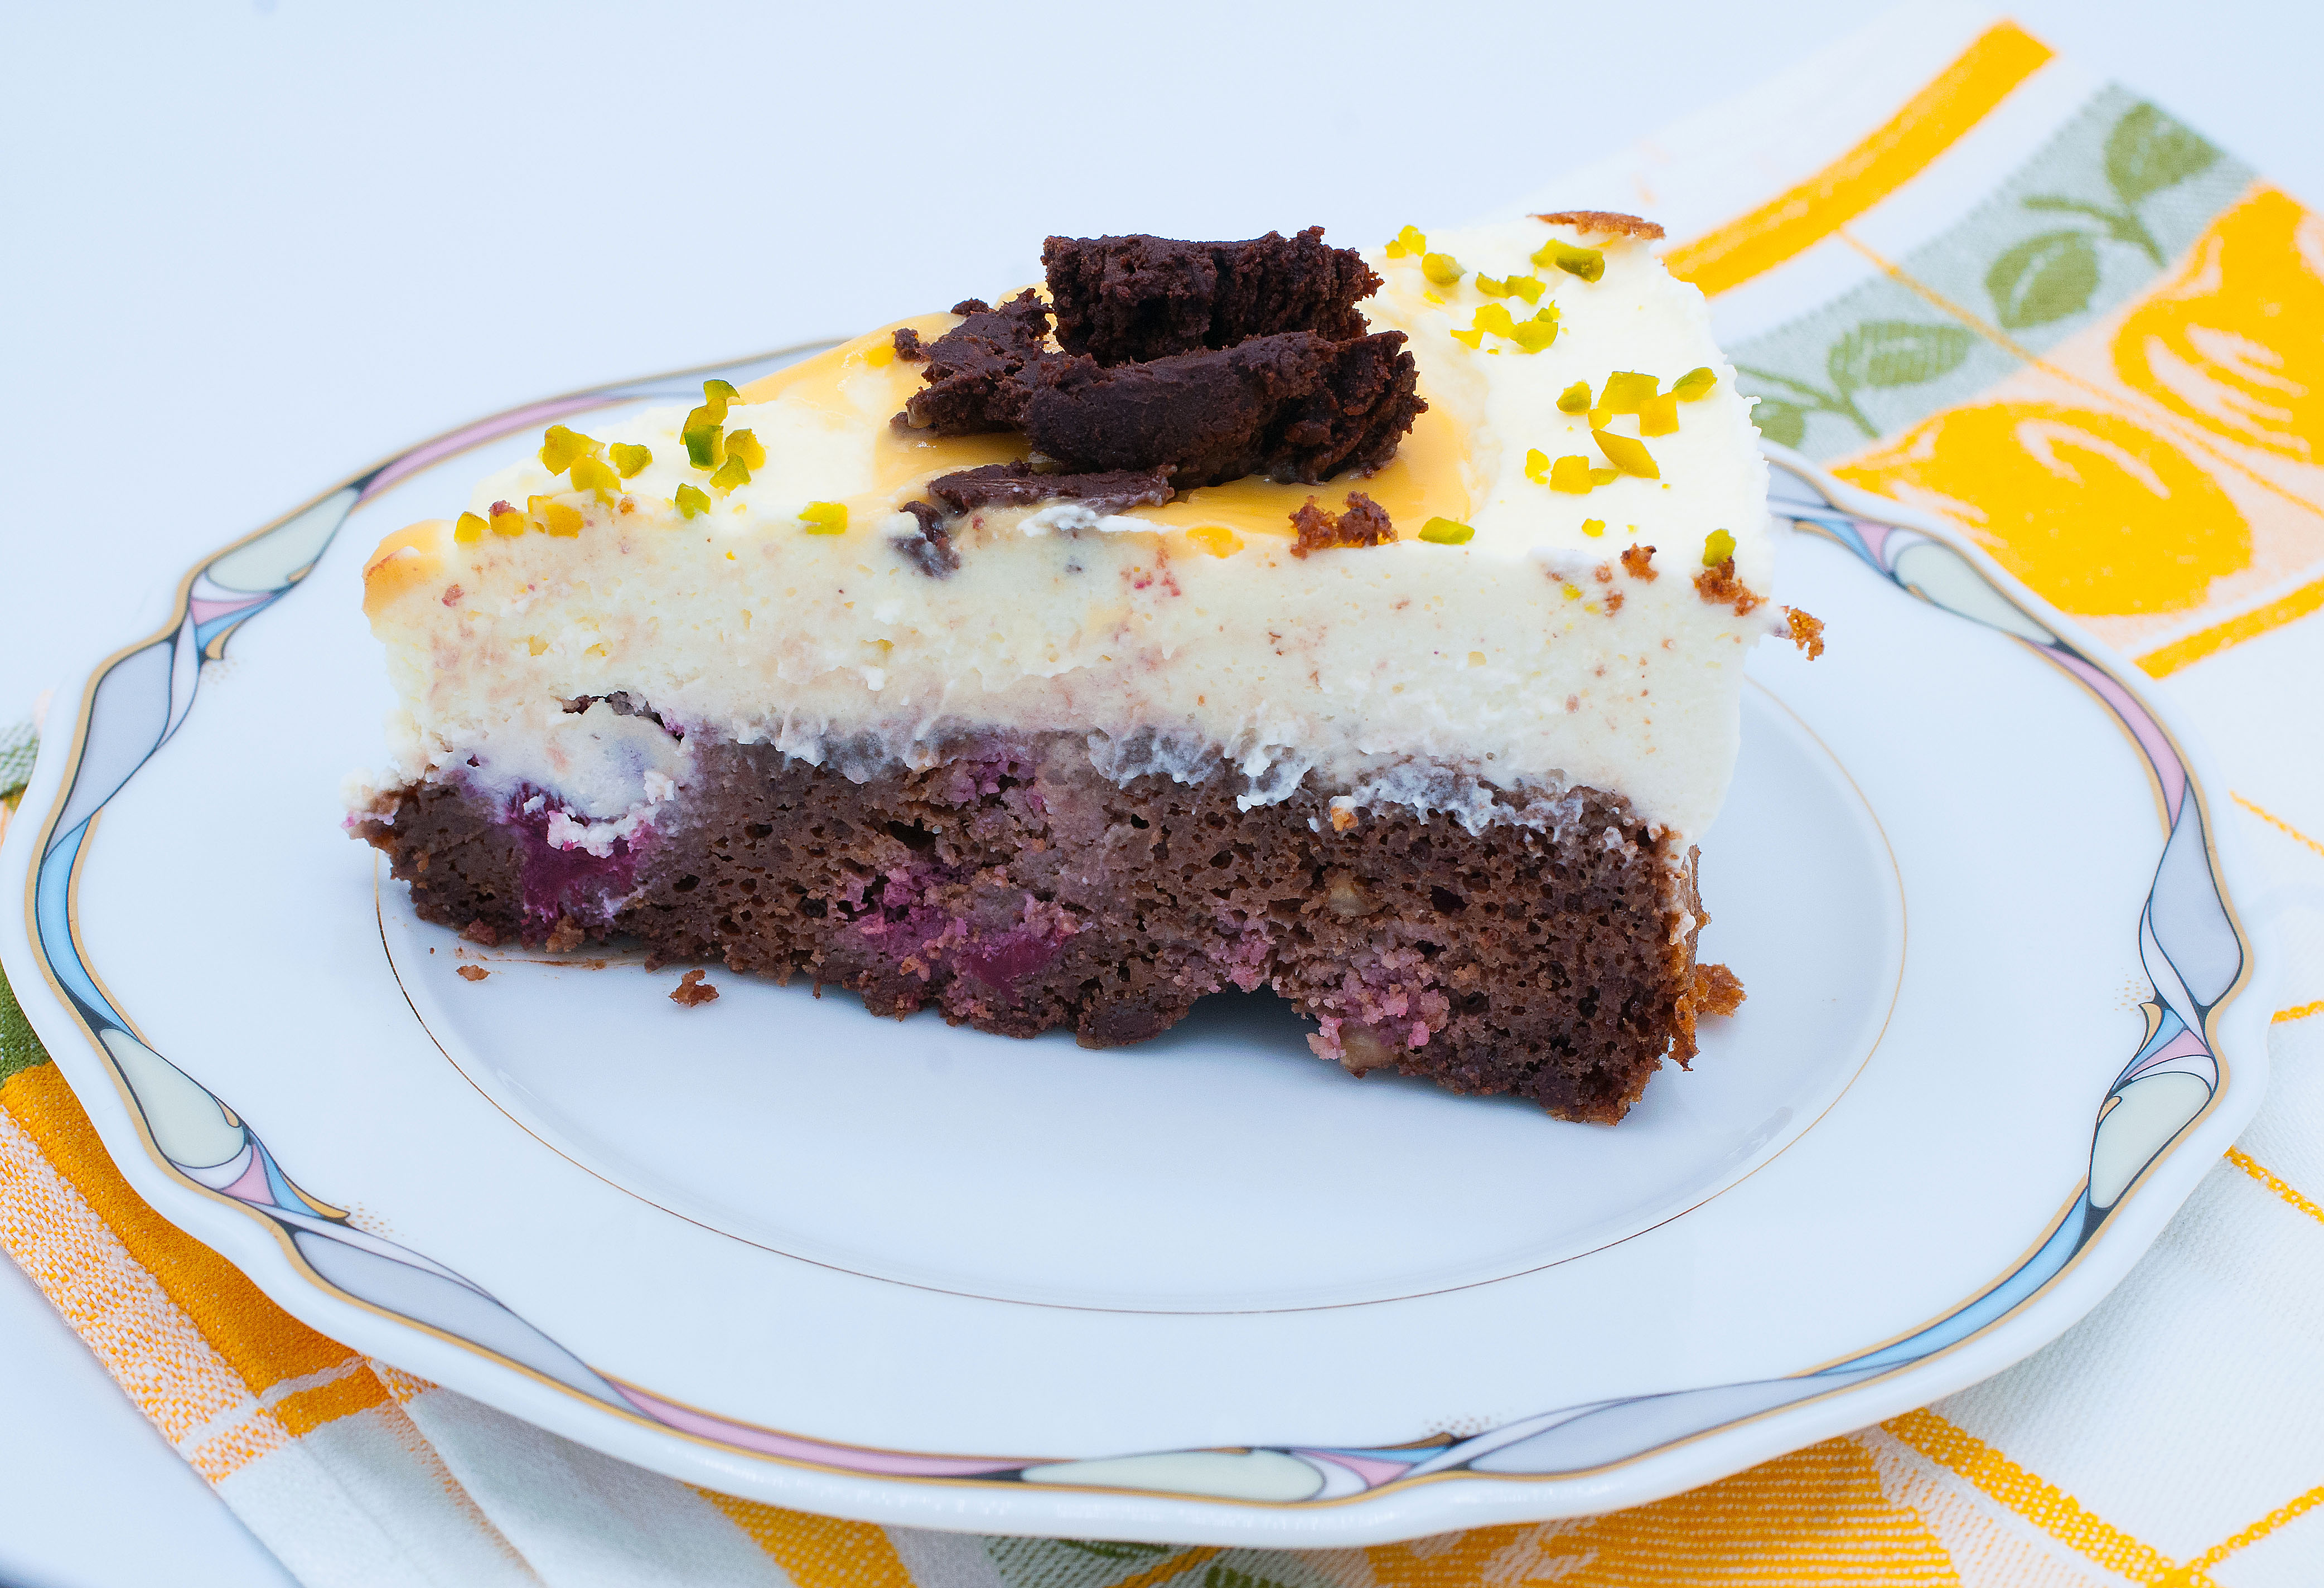 ciasta,torty alicja szrednicka-mondritzki